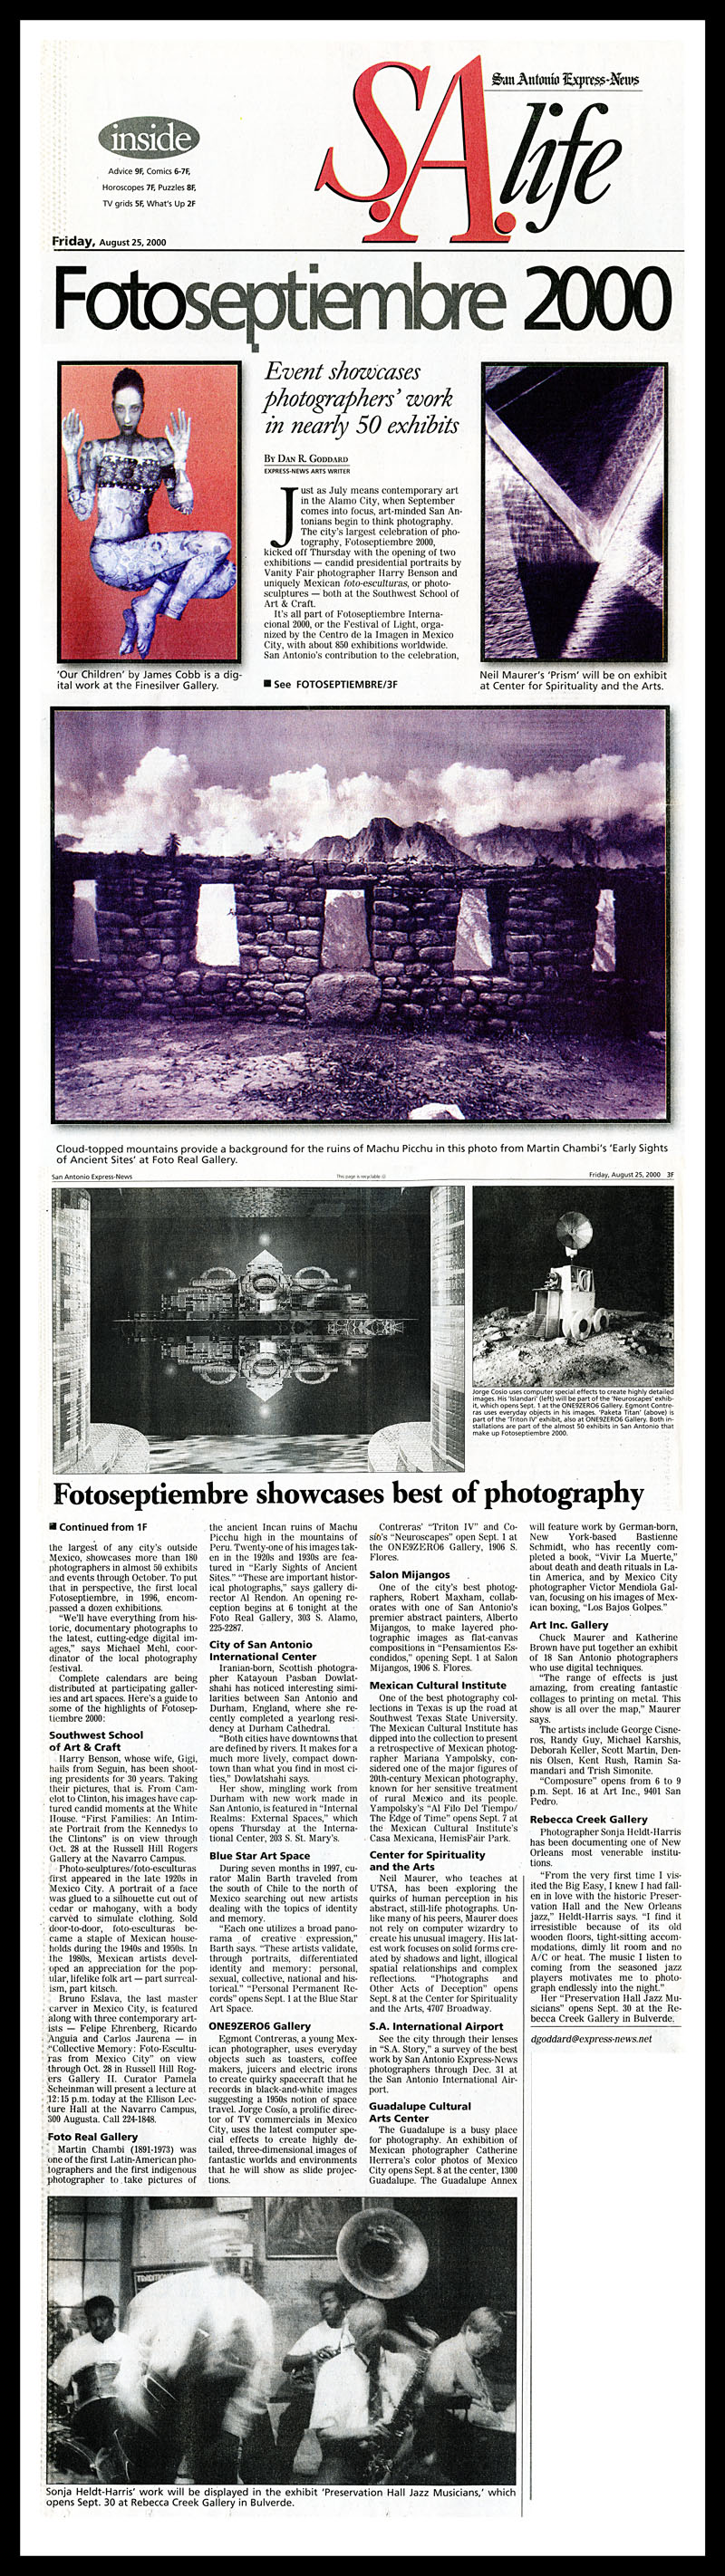 2000_Michael-Mehl_Fotoseptiembre_San-Antonio-Express-News